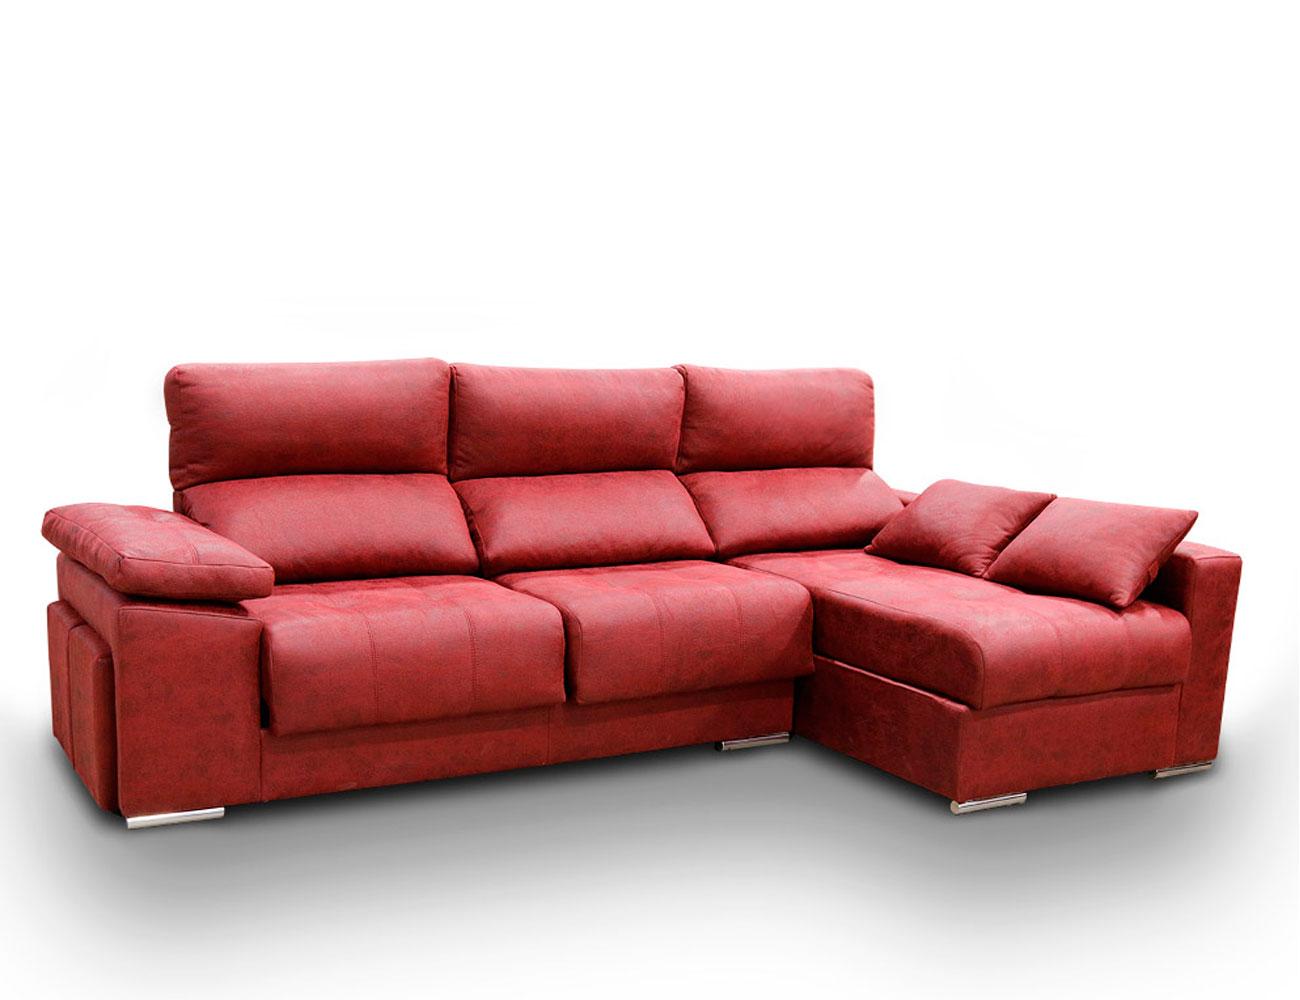 Sofa chaiselongue anti manchas rojo granate14